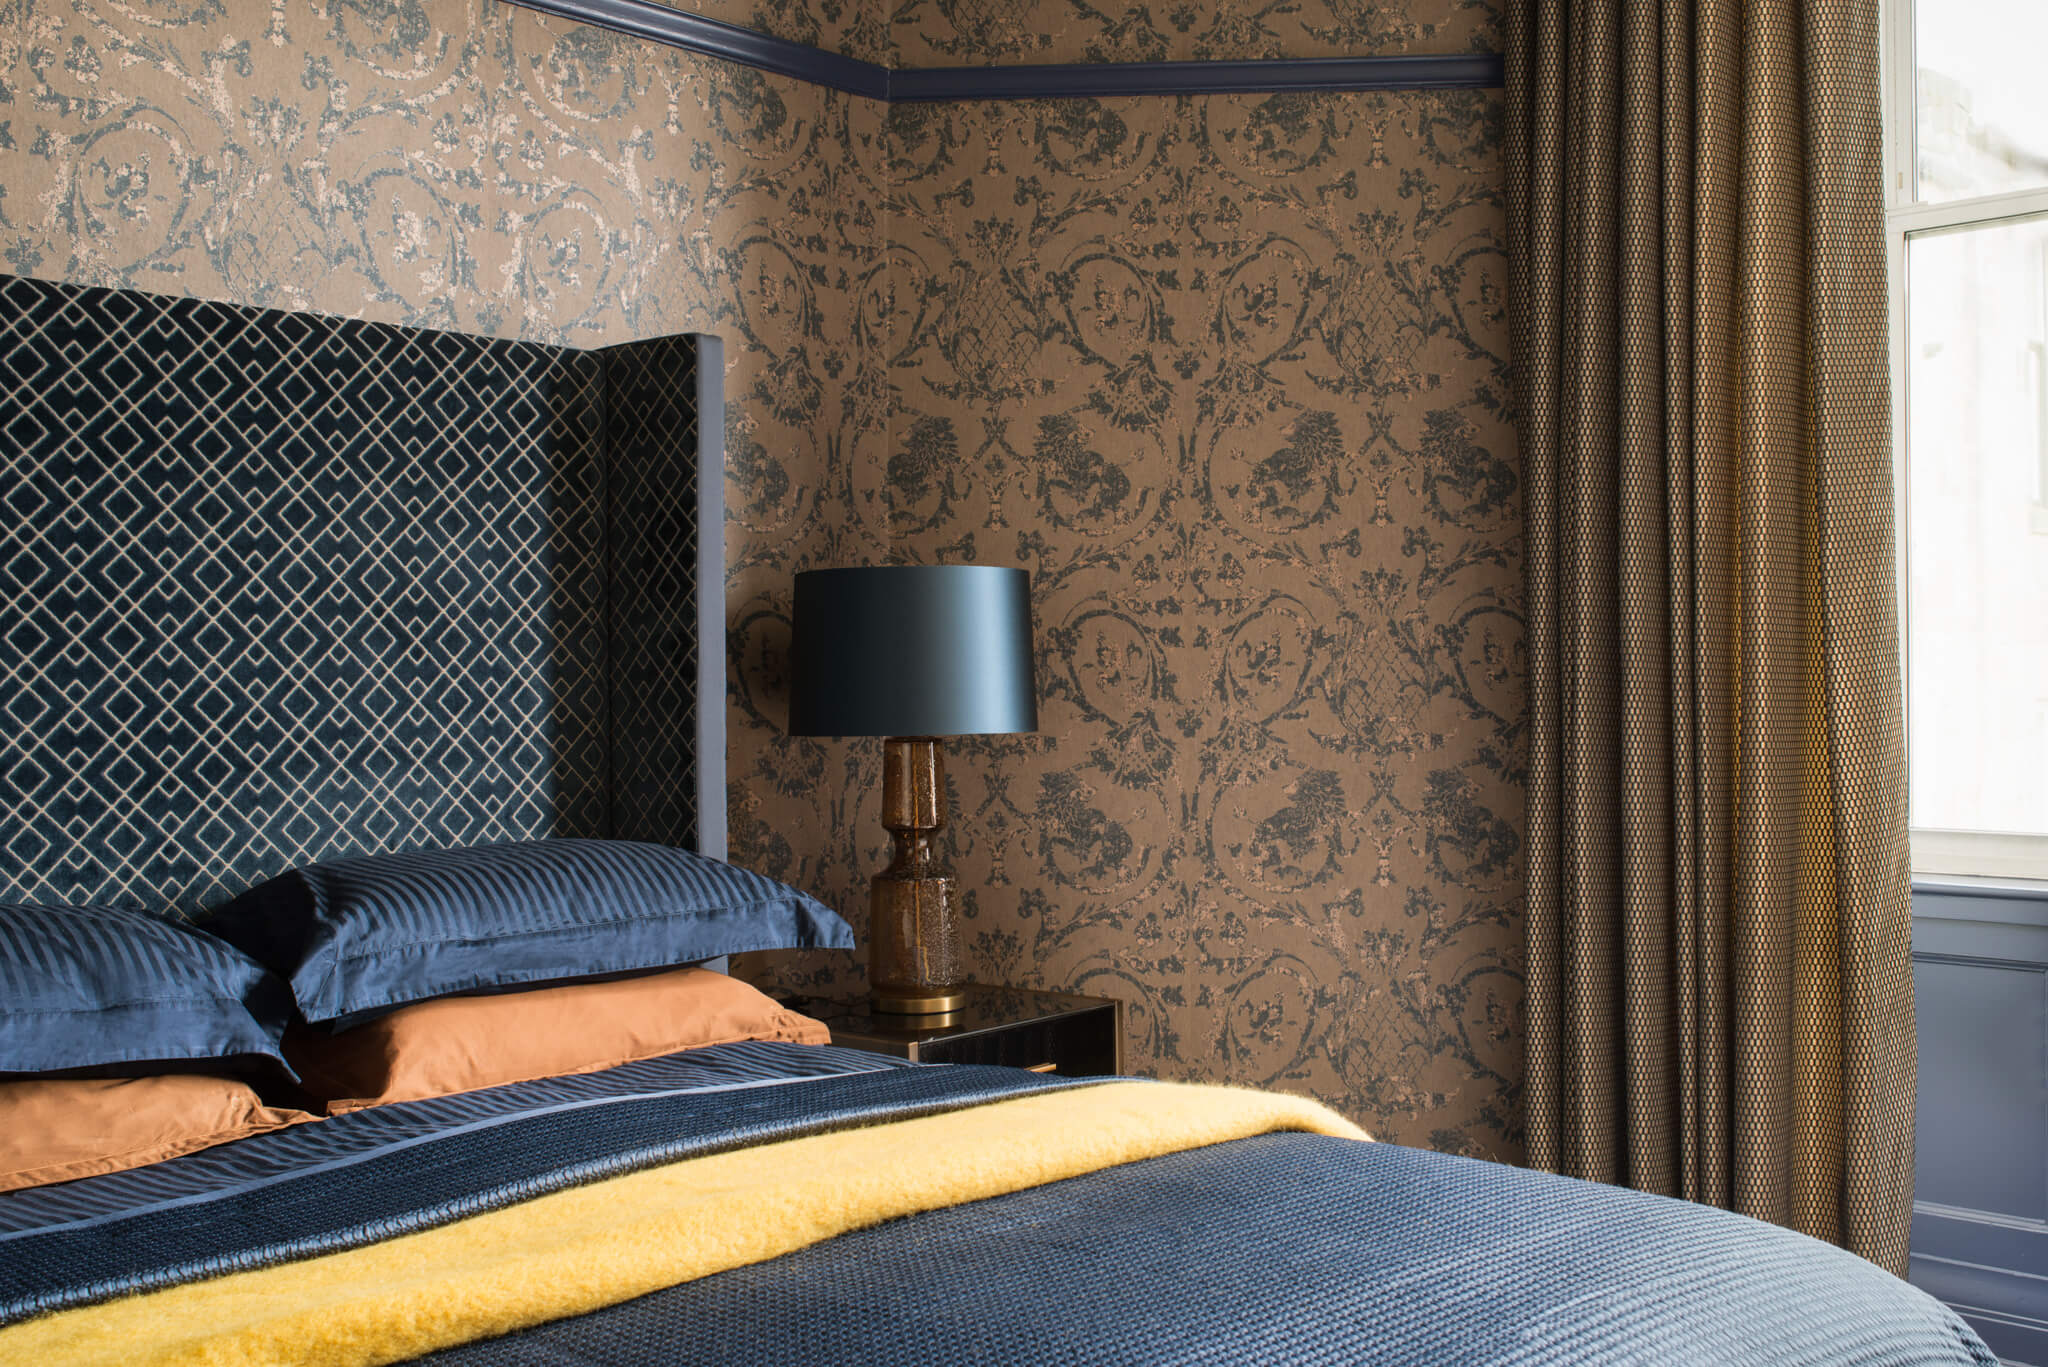 Print-Masterbedroom-Across-Bed-Chelsea-Mclaine-Interiors-Introductory-Shoot-©ZACandZAC